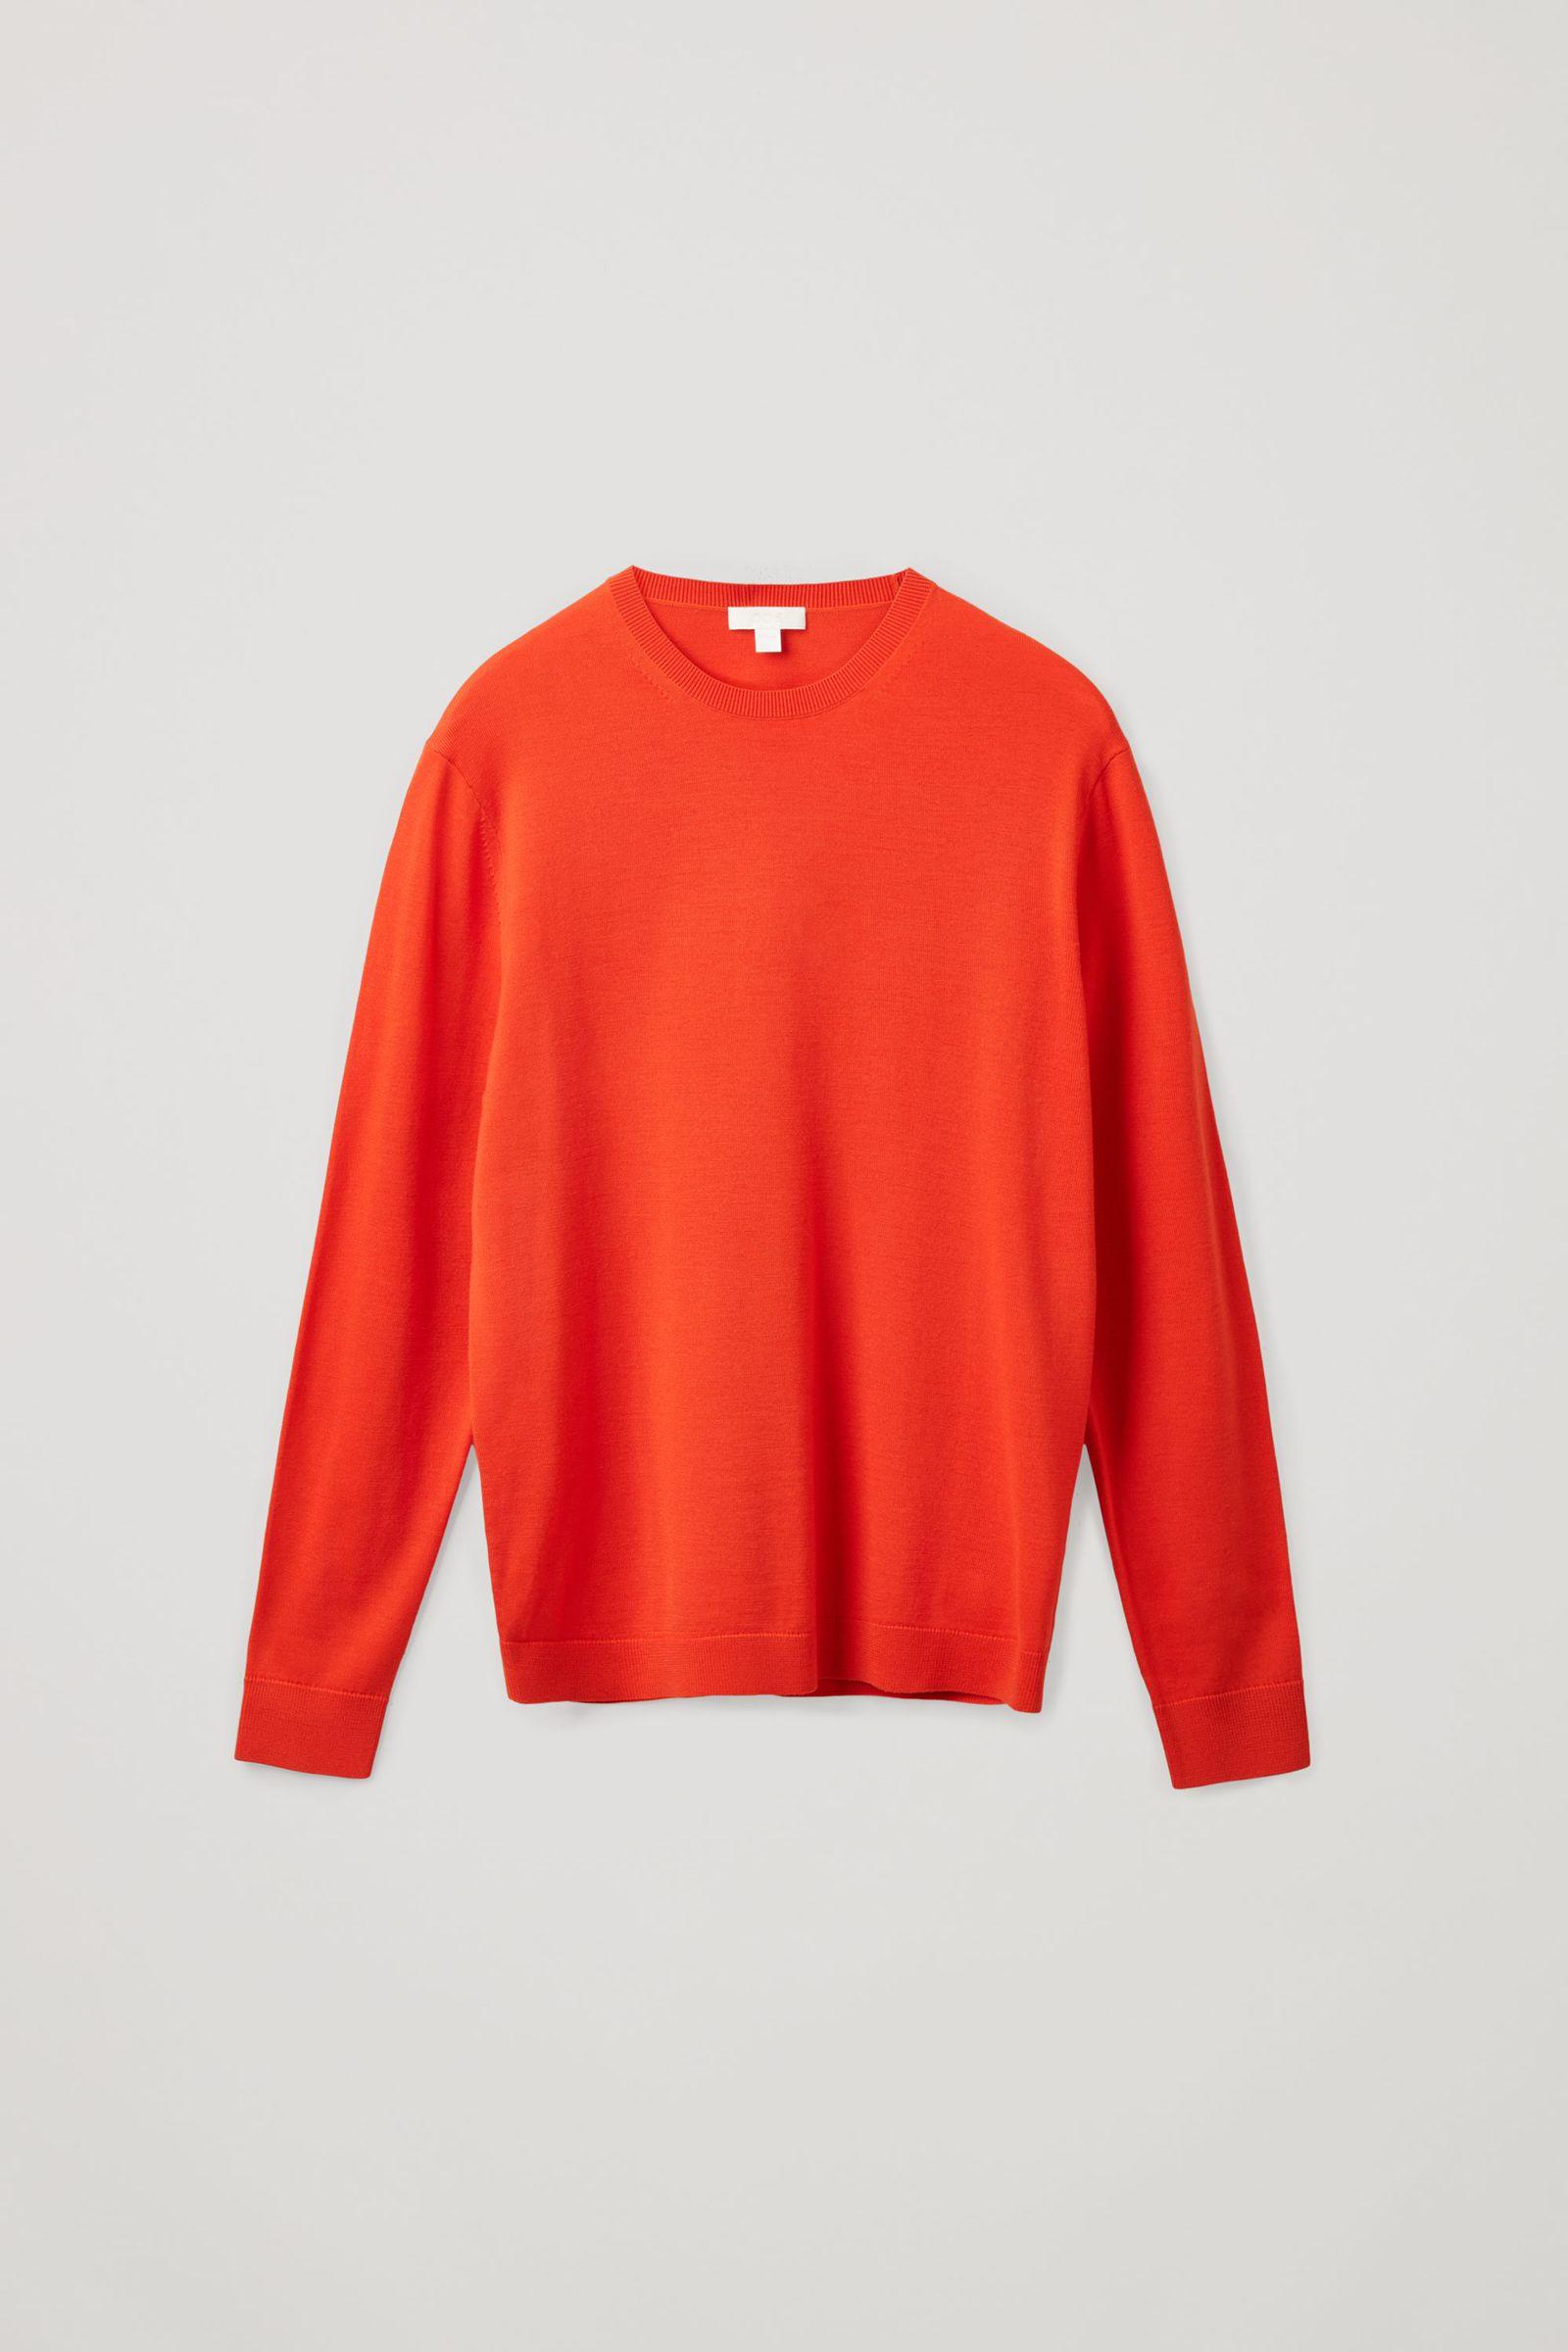 COS 메리노 크루넥 스웨터의 오렌지컬러 Product입니다.